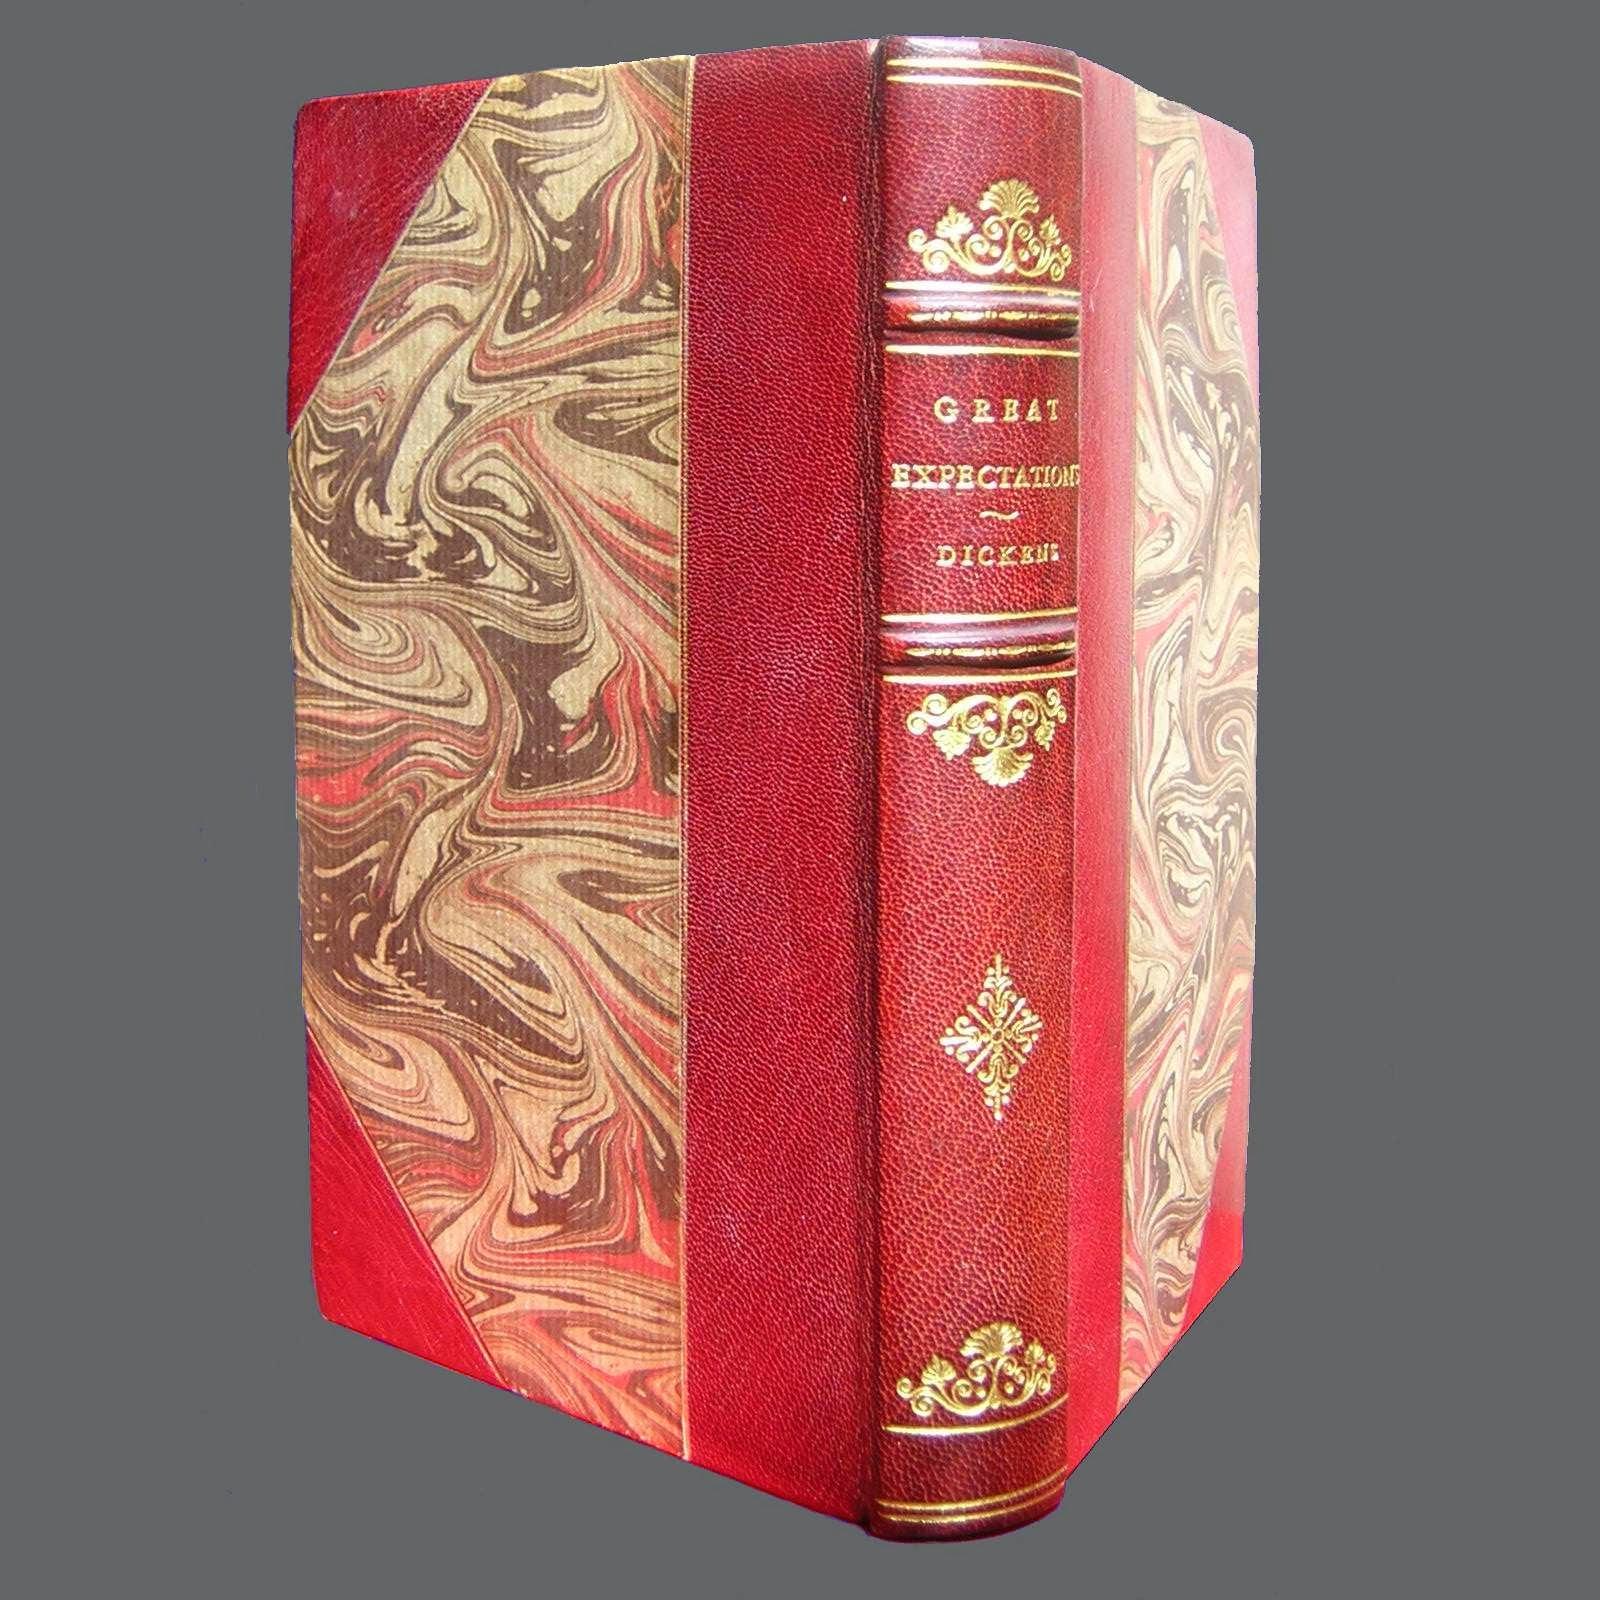 Inspiration And Originality Underlined: Fine Press Books